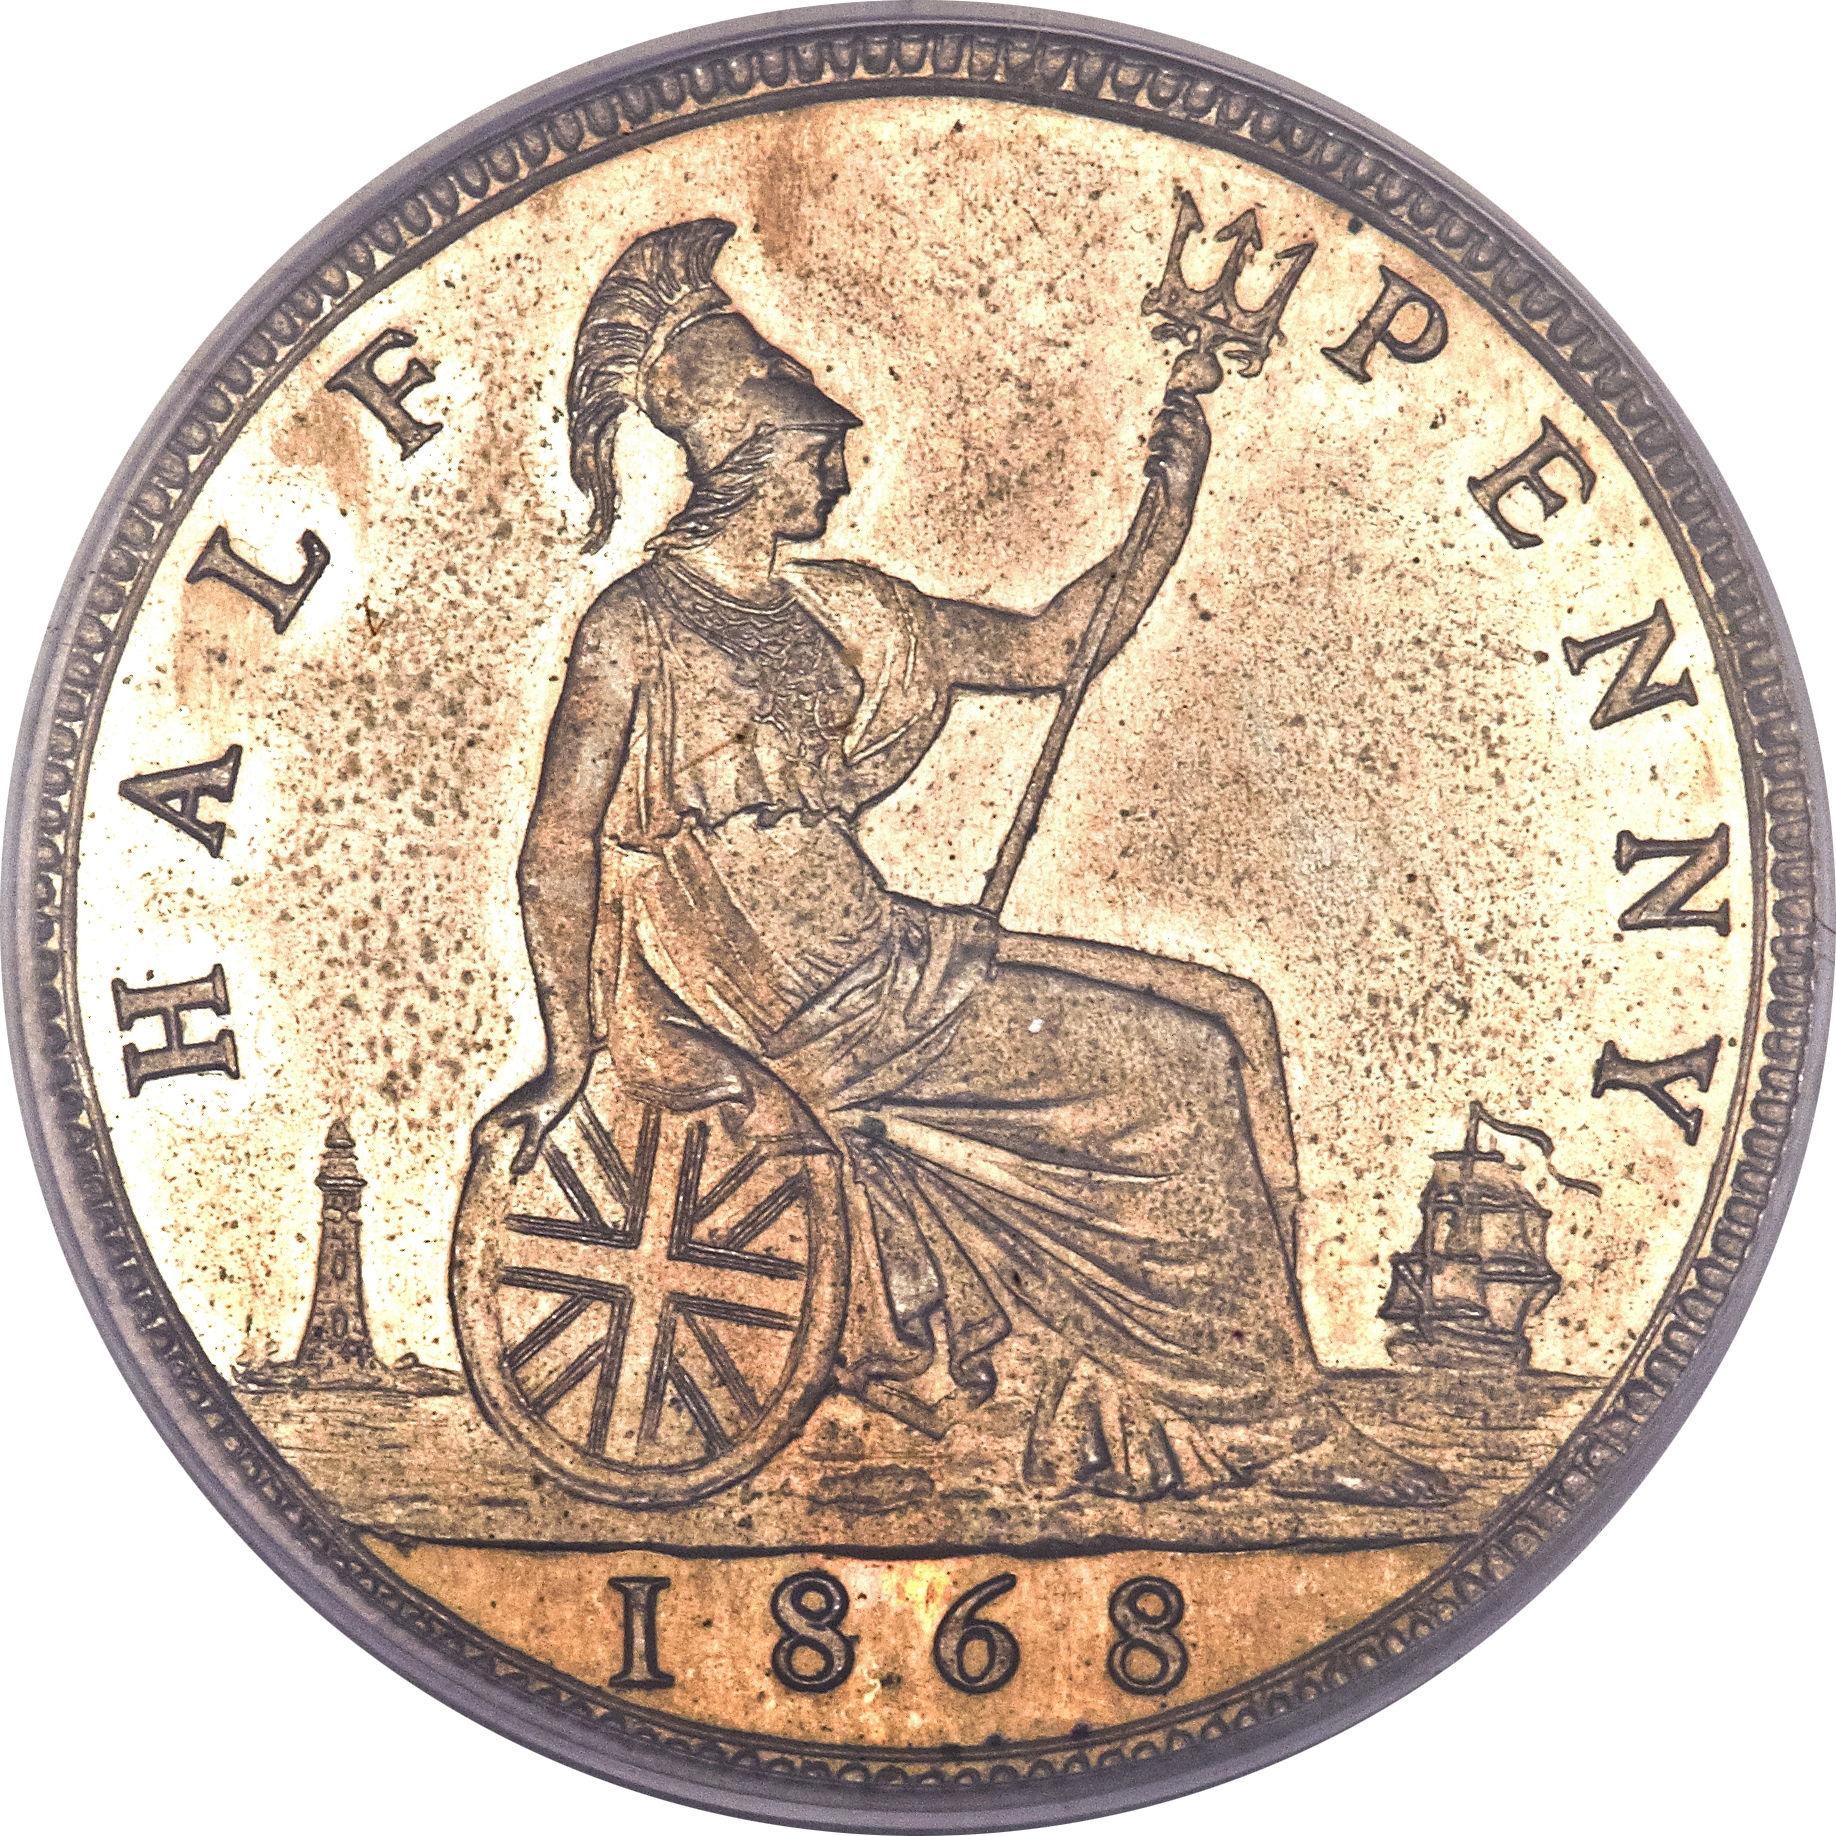 ½ Penny - Victoria (2nd portrait) - United Kingdom – Numista